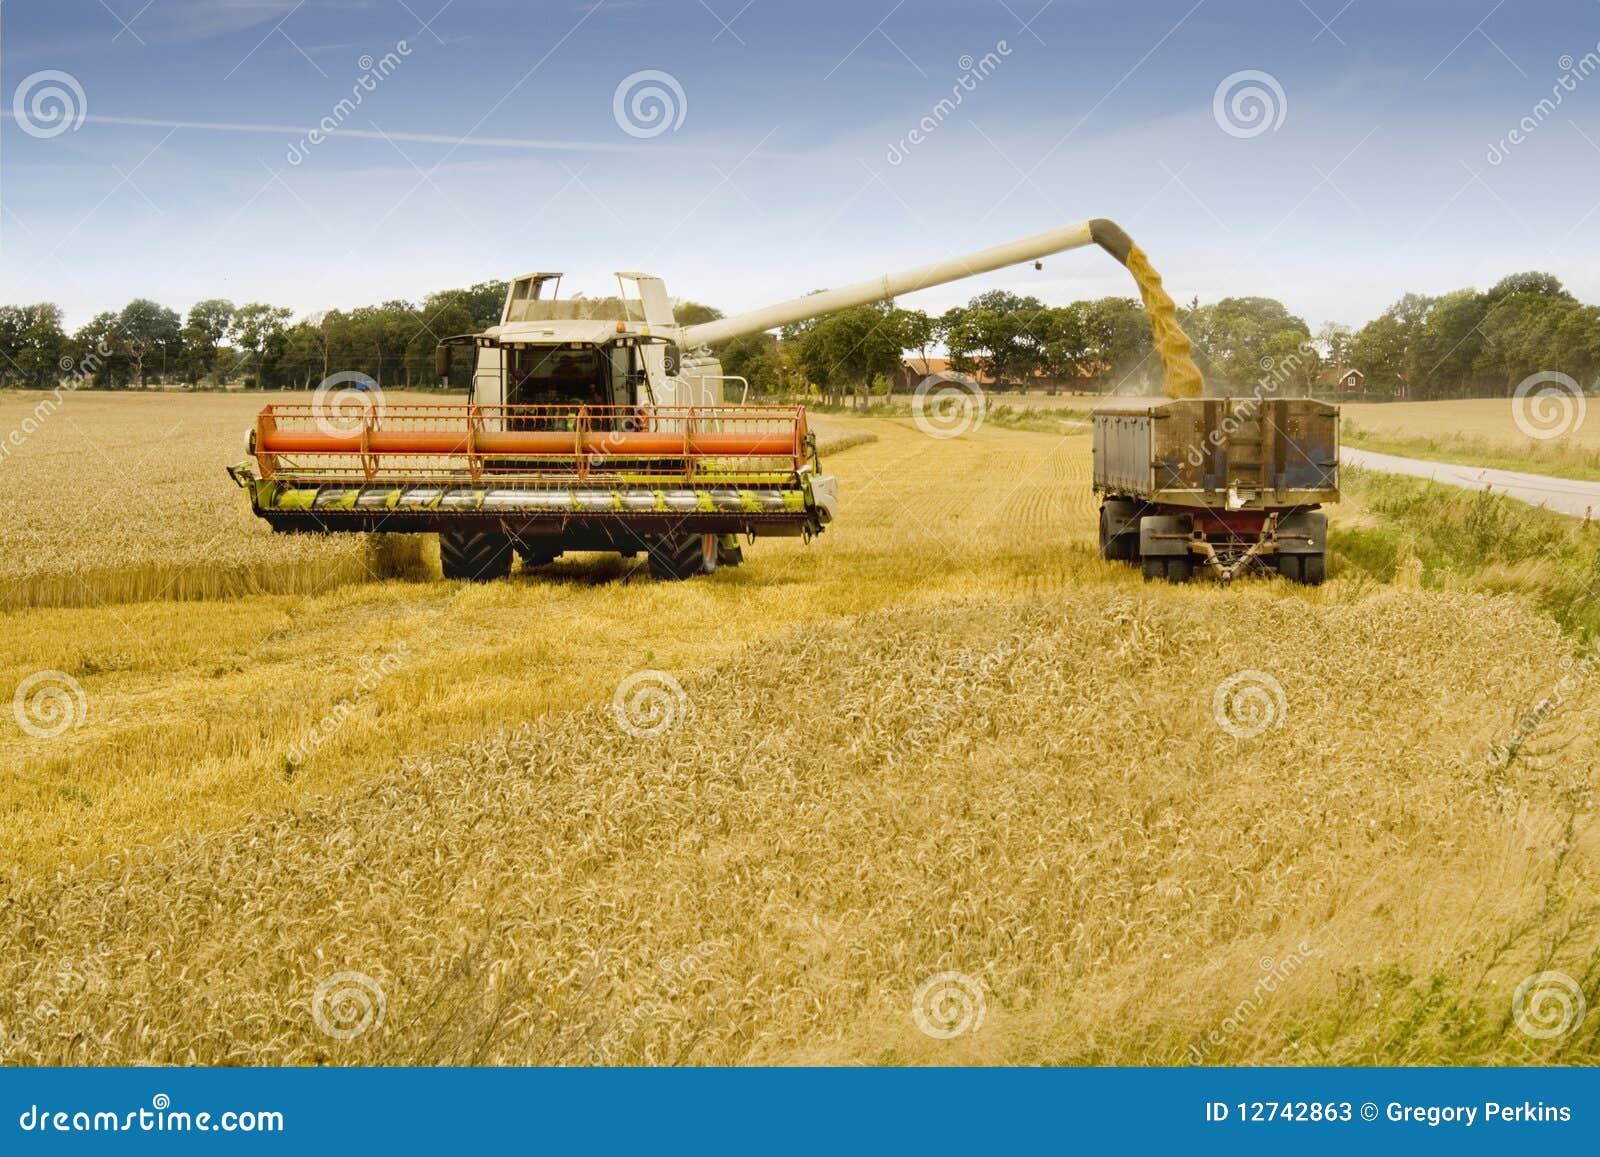 combine harvester loading grain into a trailer stock image